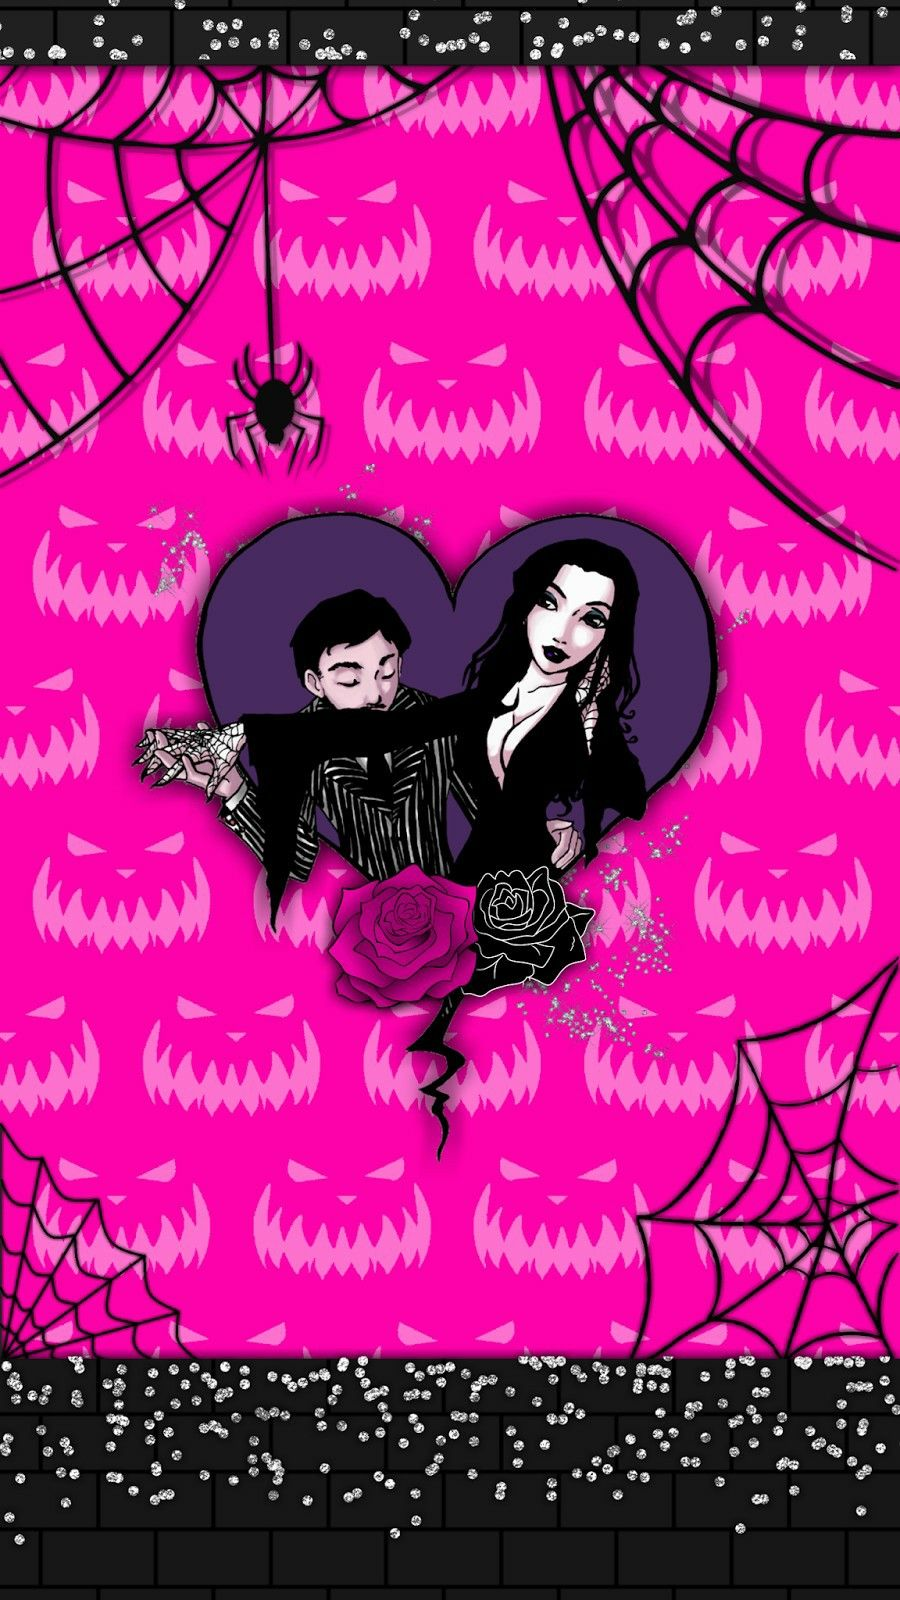 Must see Wallpaper Halloween Pink - 5175c03b053efaa06517c499638ff0f0  Picture_628821.jpg